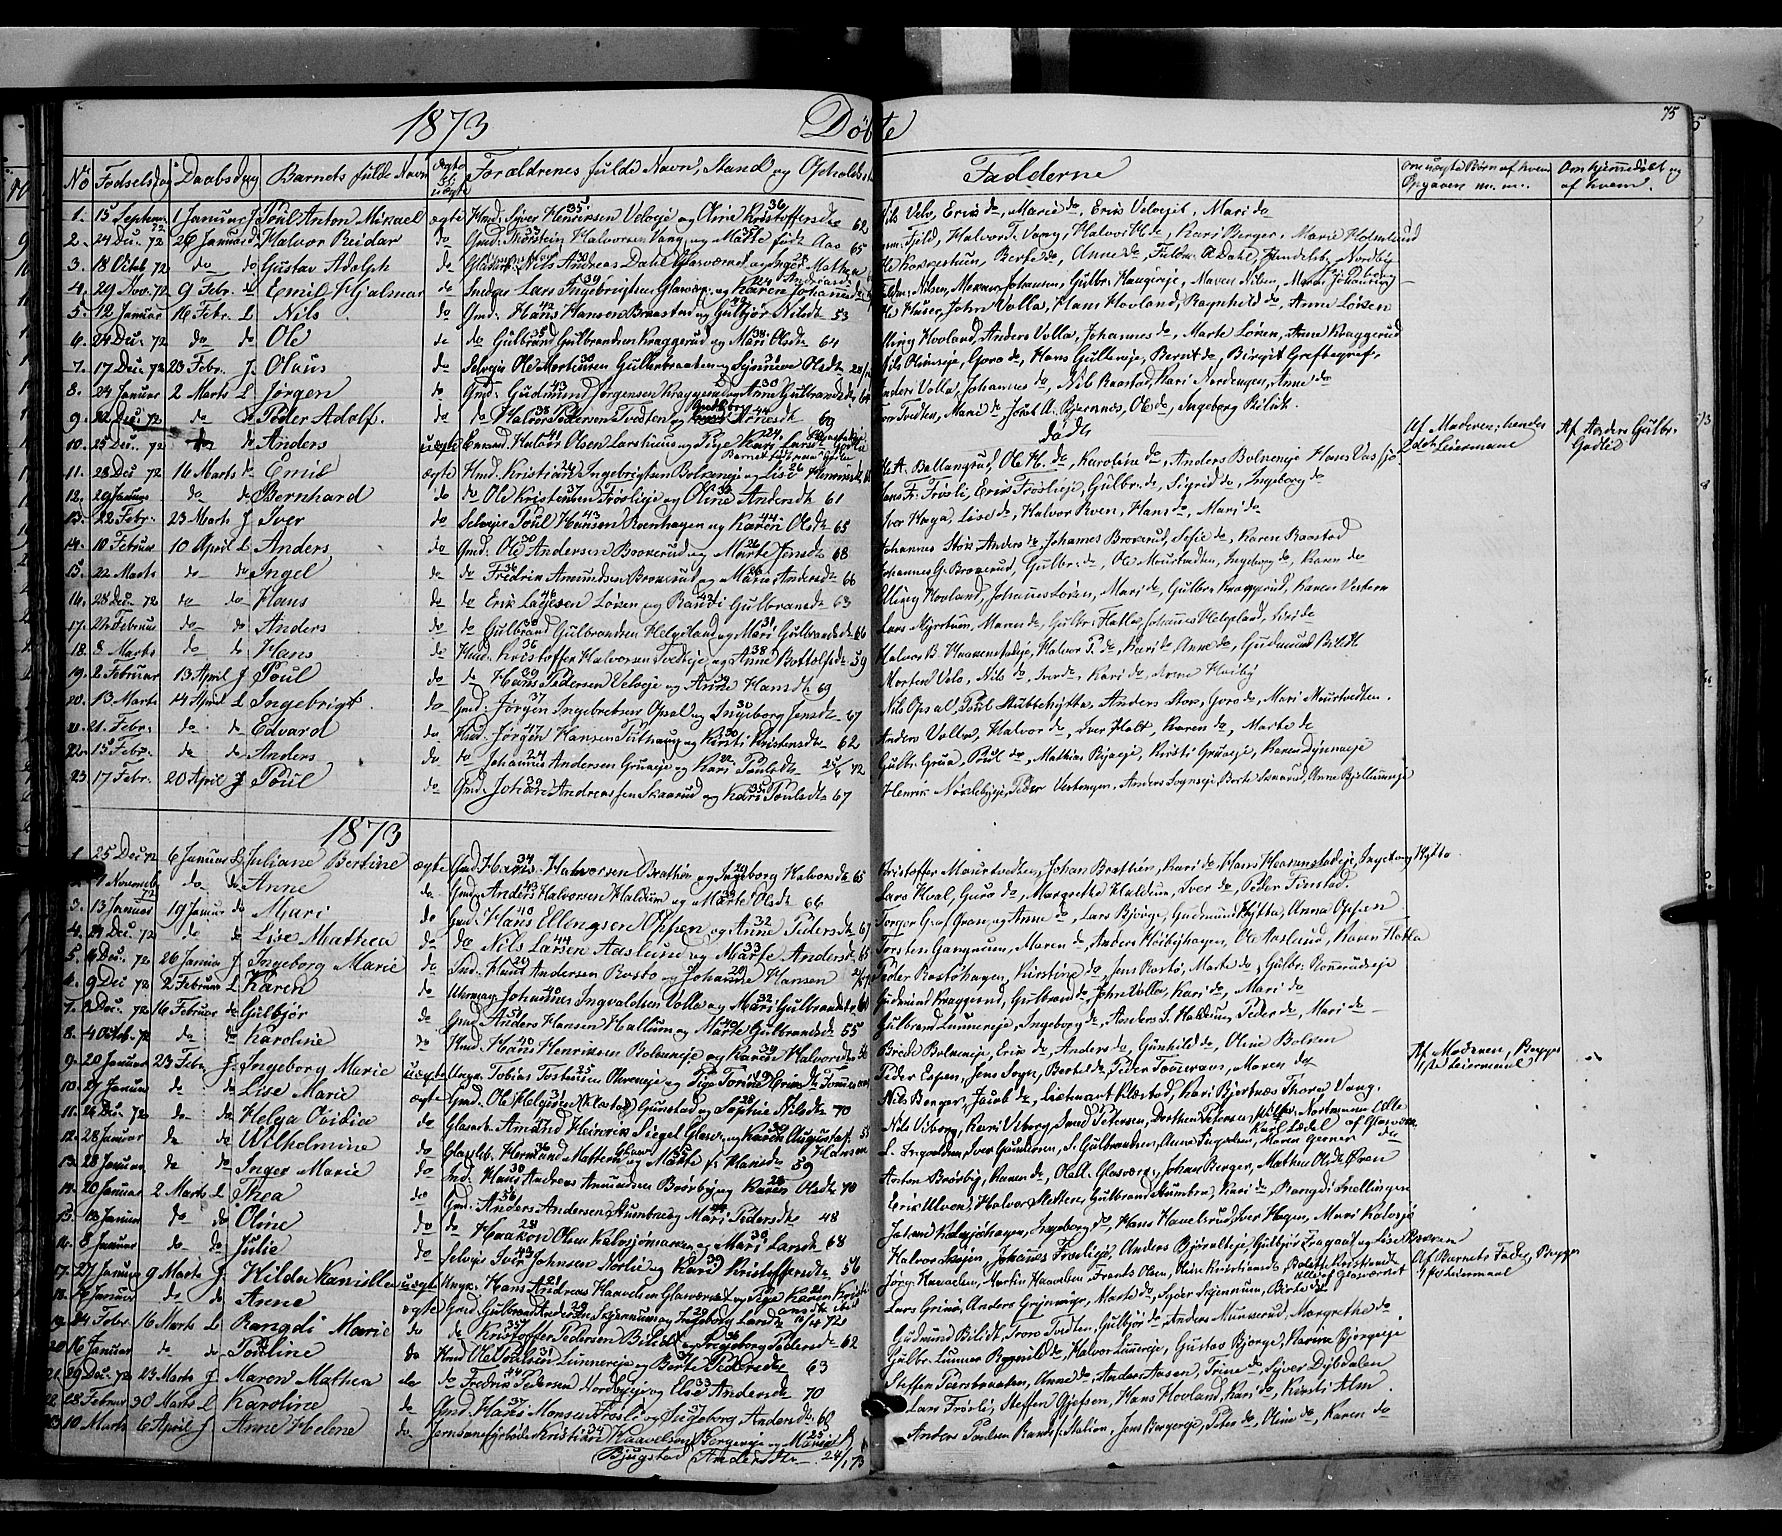 SAH, Jevnaker prestekontor, Ministerialbok nr. 7, 1858-1876, s. 75